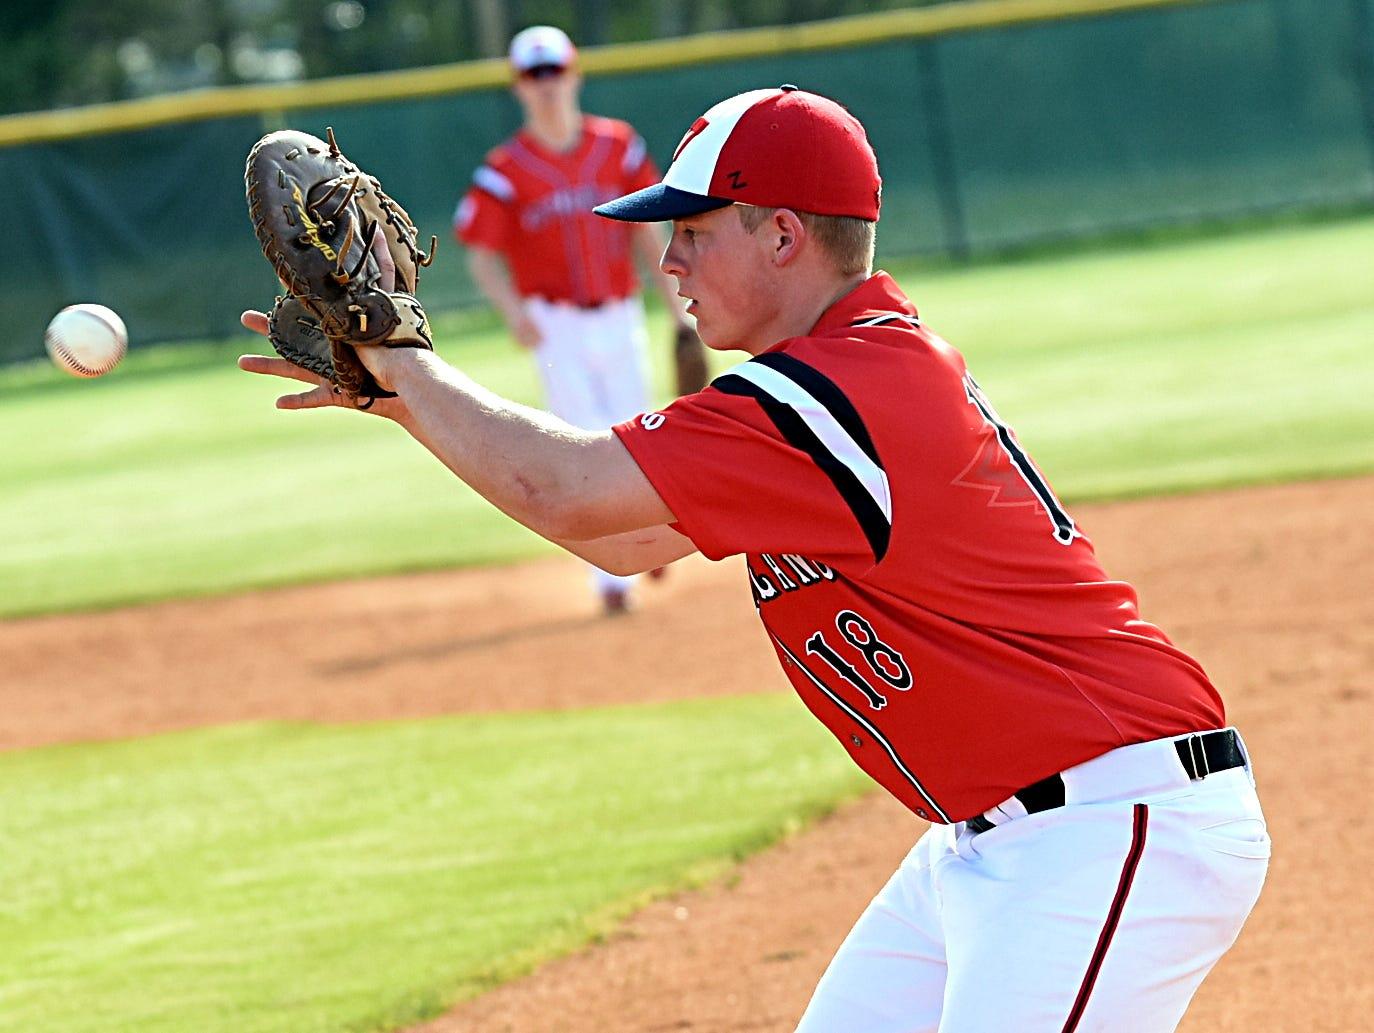 Westmoreland High junior first basman Hunter Crowson fields a second-inning ground ball.